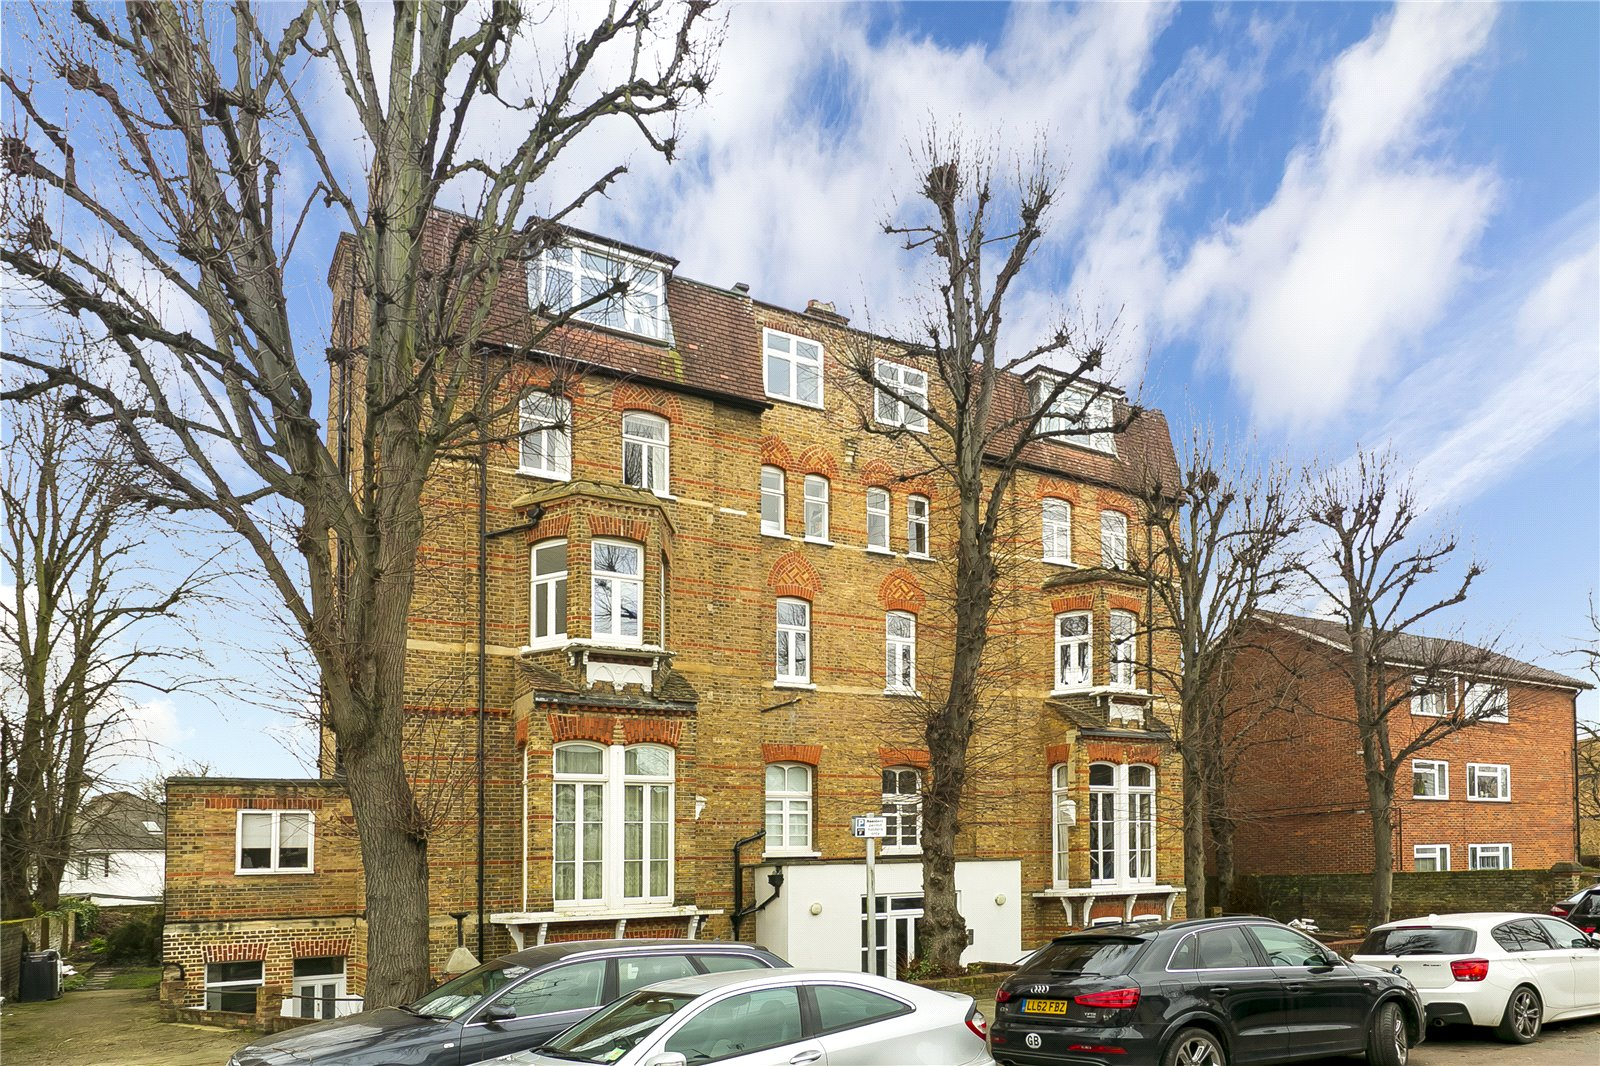 Arlington Road, St Margarets, TW1 2AX - Antony Roberts